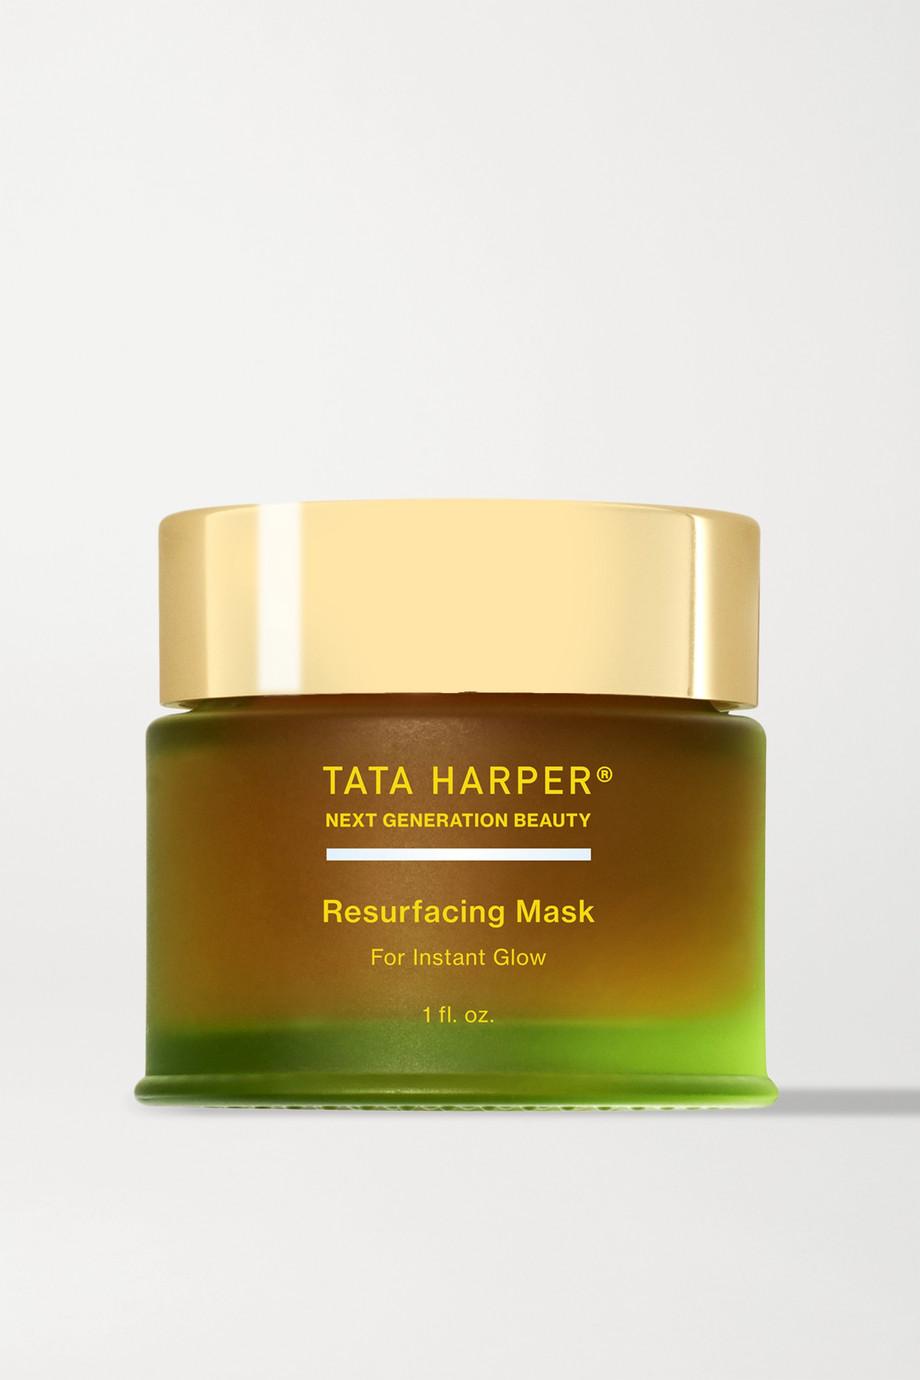 Resurfacing Mask, 30ml, by Tata Harper